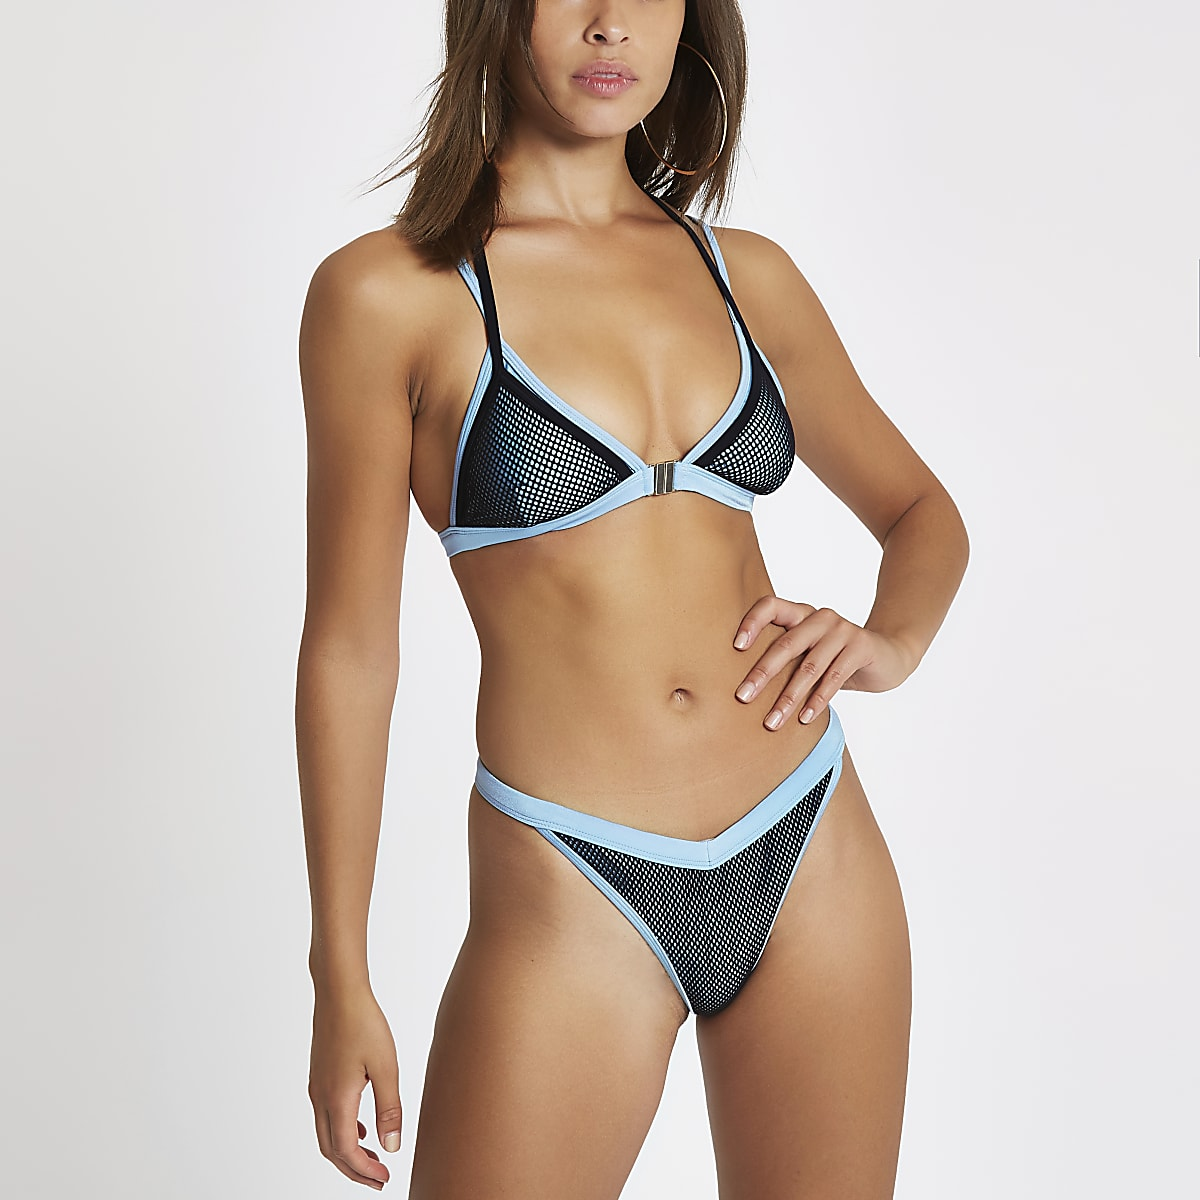 Blauwe mesh hoog opgesneden bikinibroekje